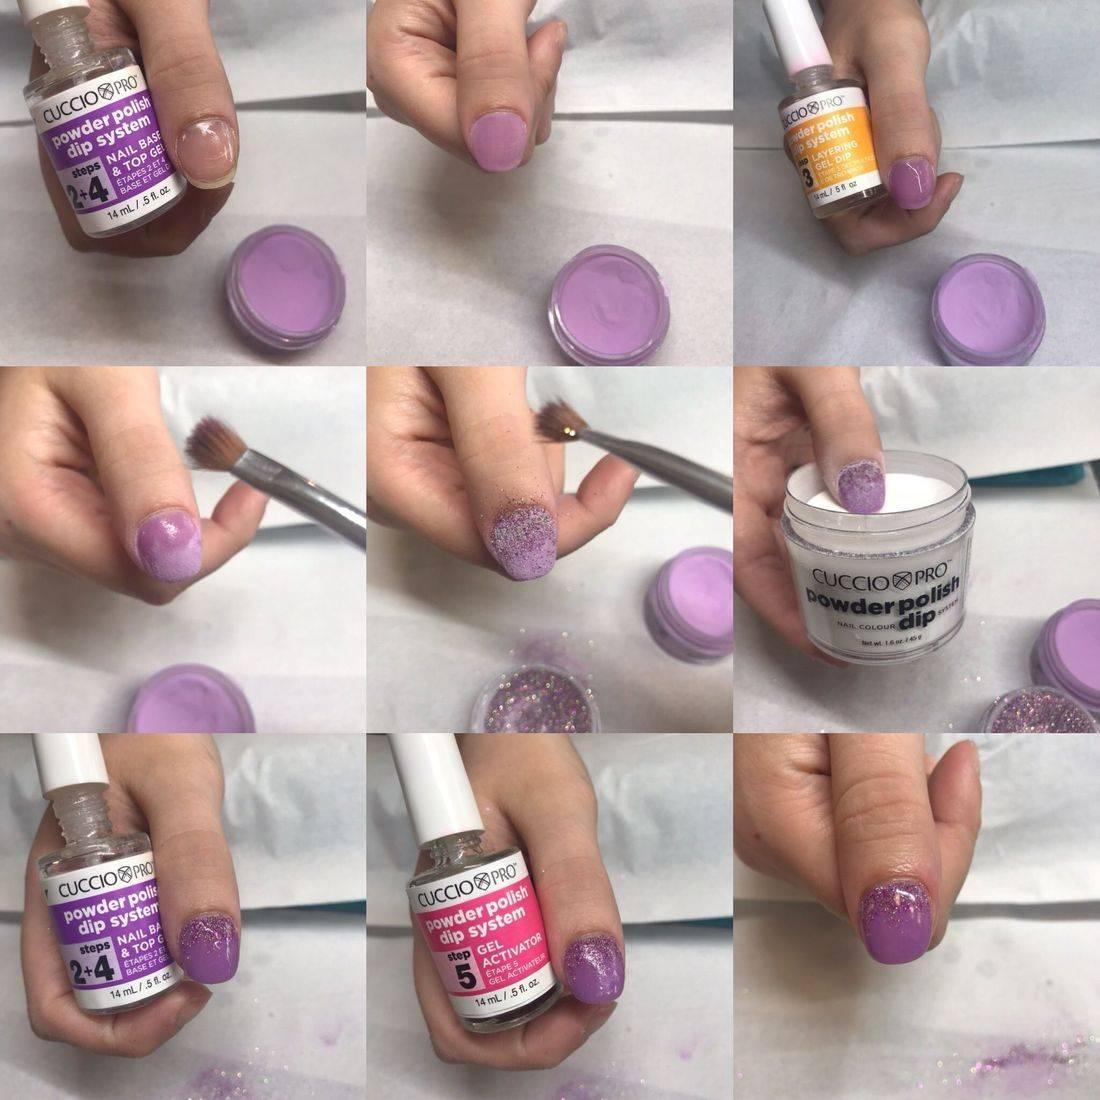 acrylic dip nail training, gaynor louise nail academy, nail training bury north west, cuccio nail courses, french ombre nails. baby boomer nails